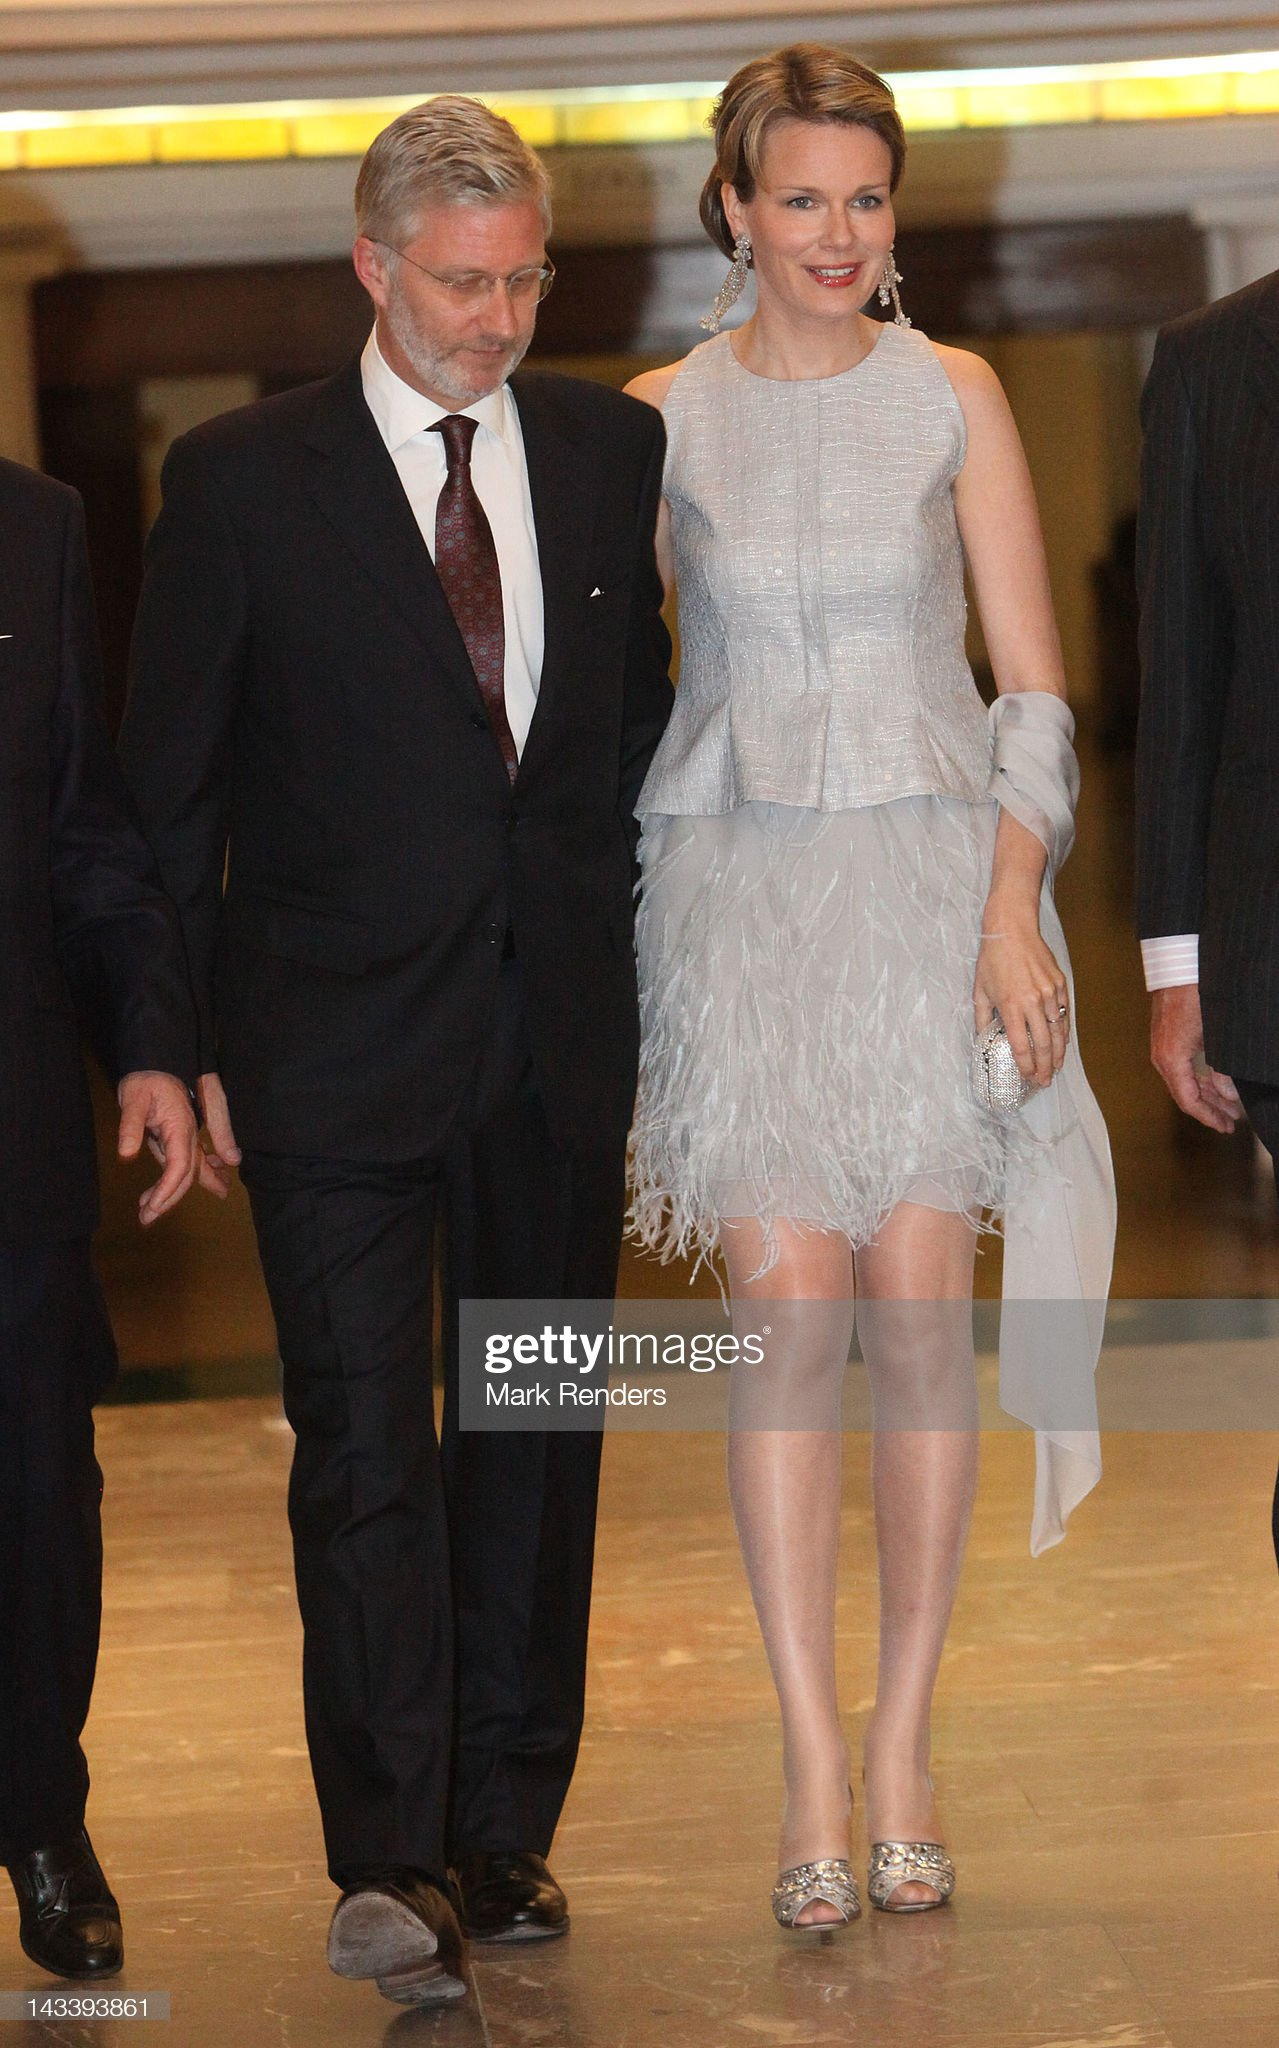 Вечерние наряды Королевы Матильды Prince Philippe And Princess Mathilde Of Belgium Attend 10th European Business Summit Gala Dinner : News Photo